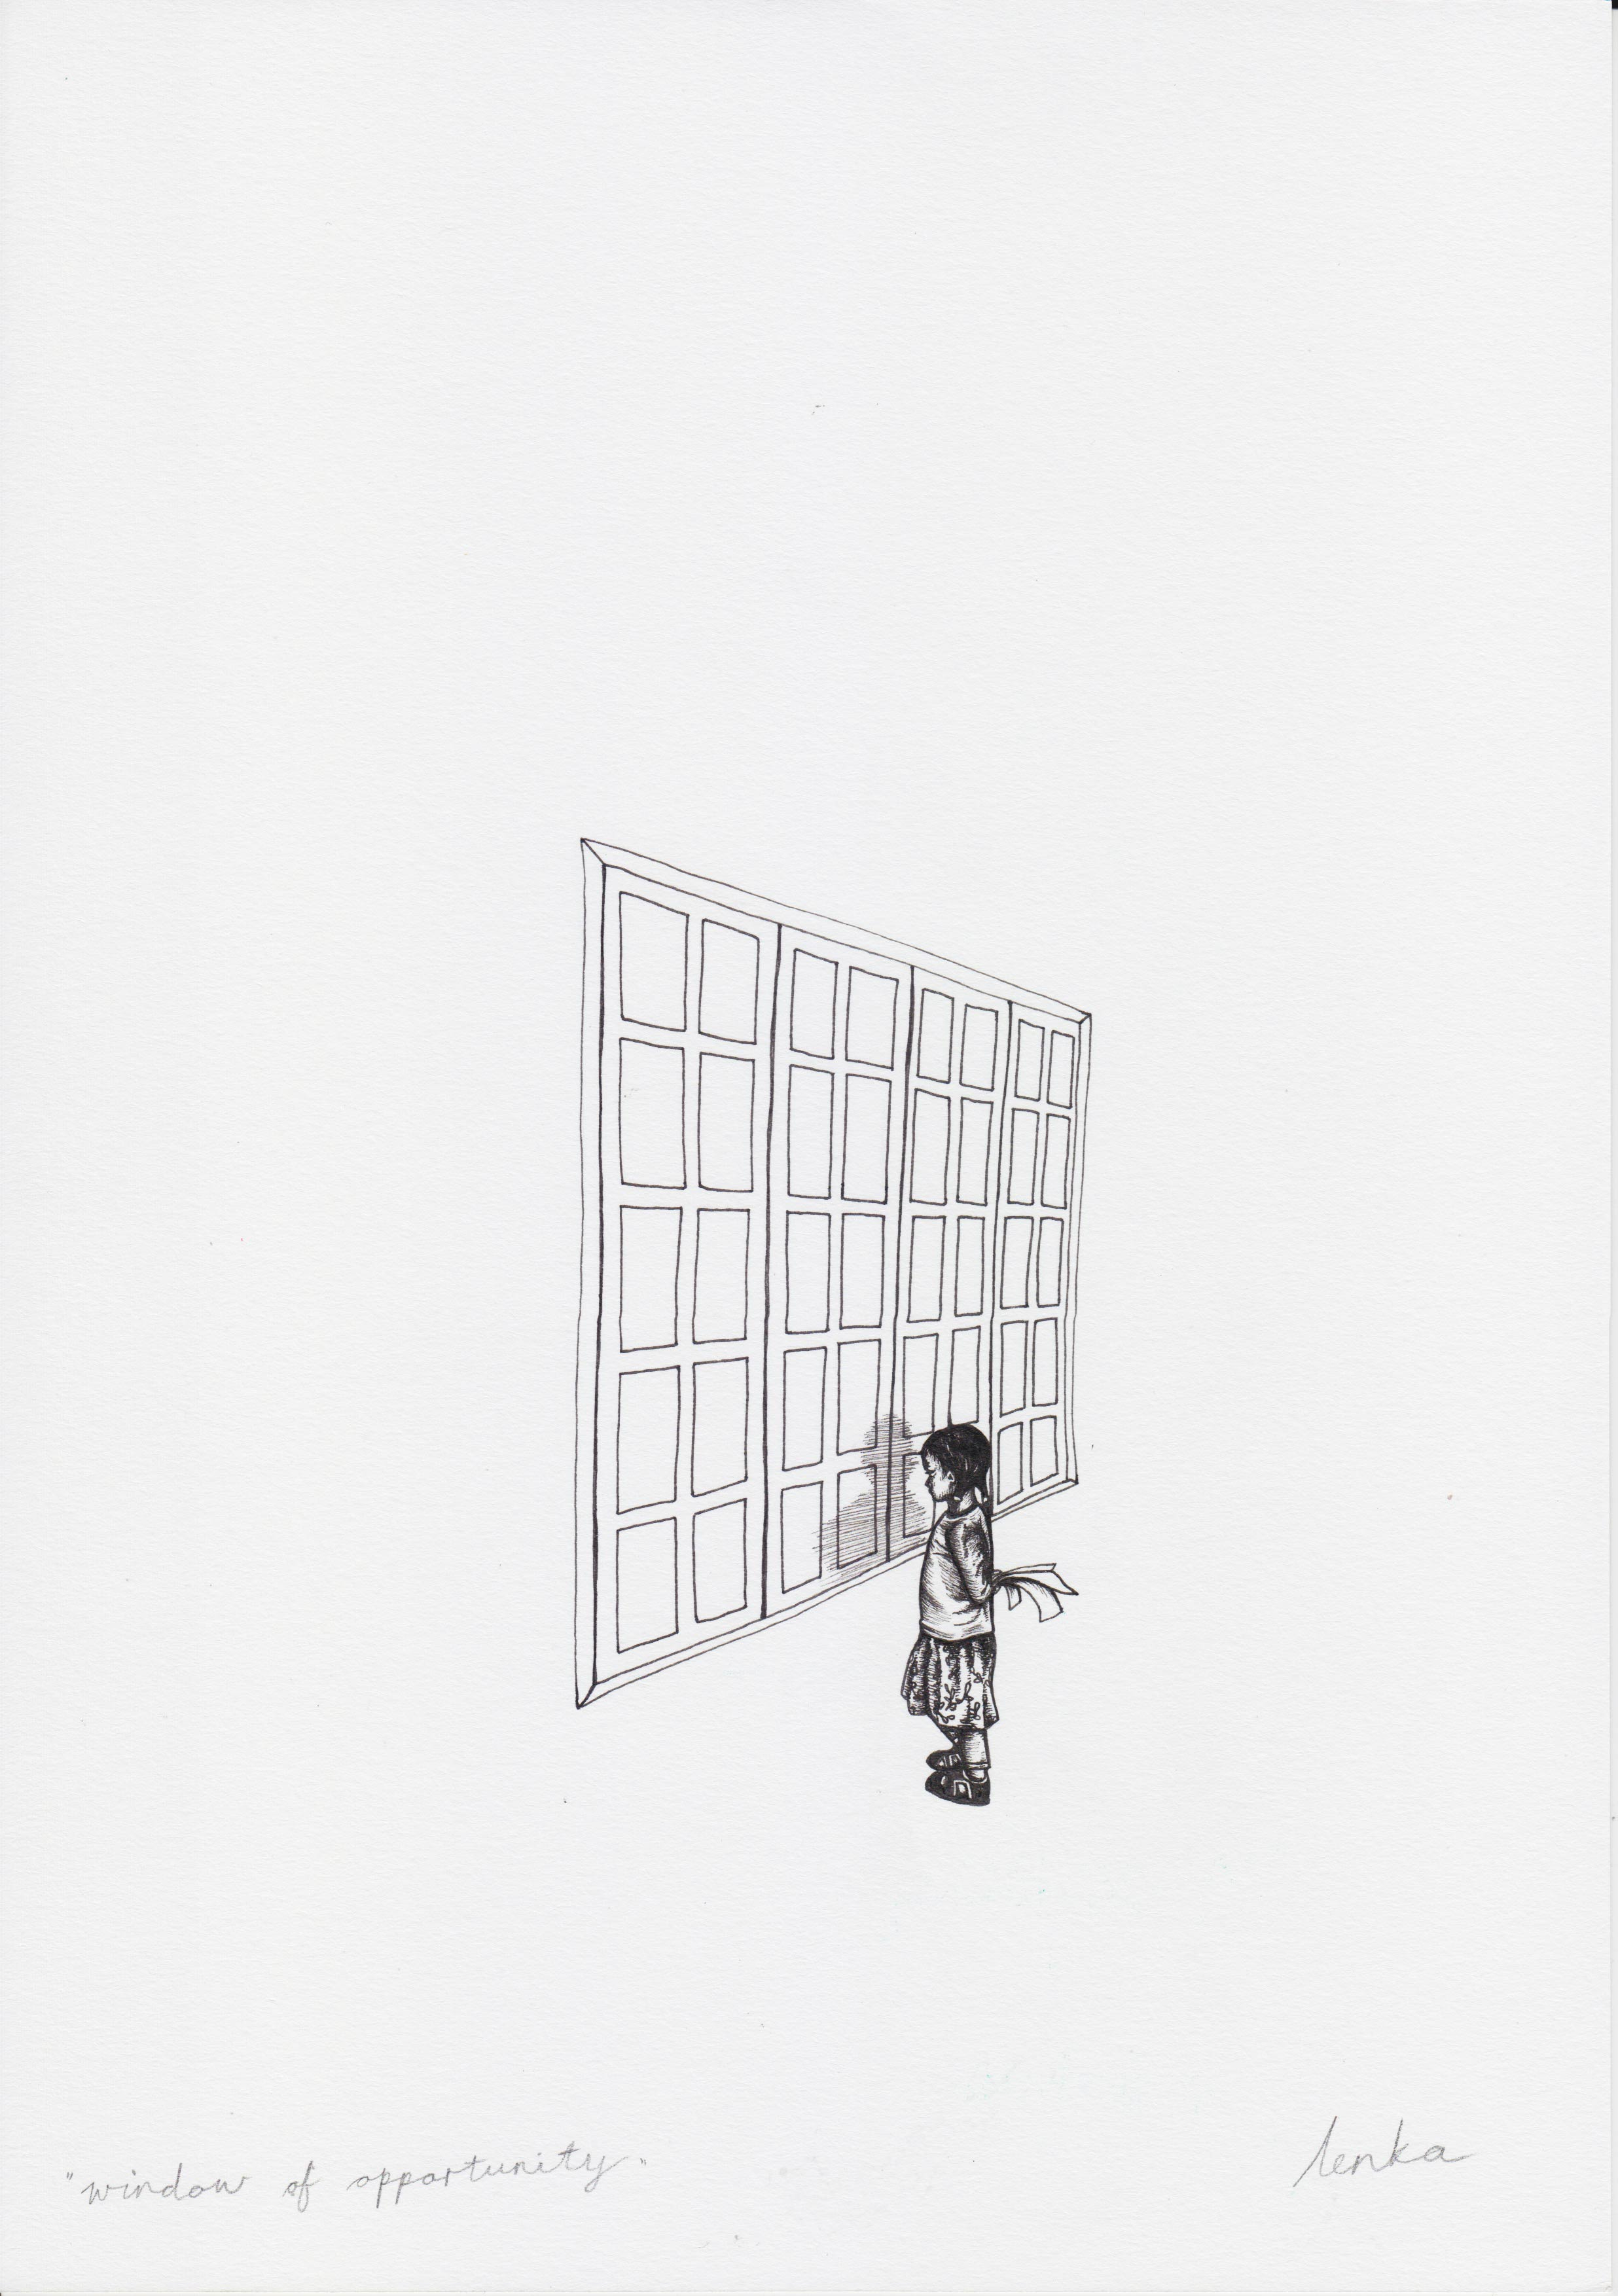 Lenka Cronje – Nr. 1.07 – window